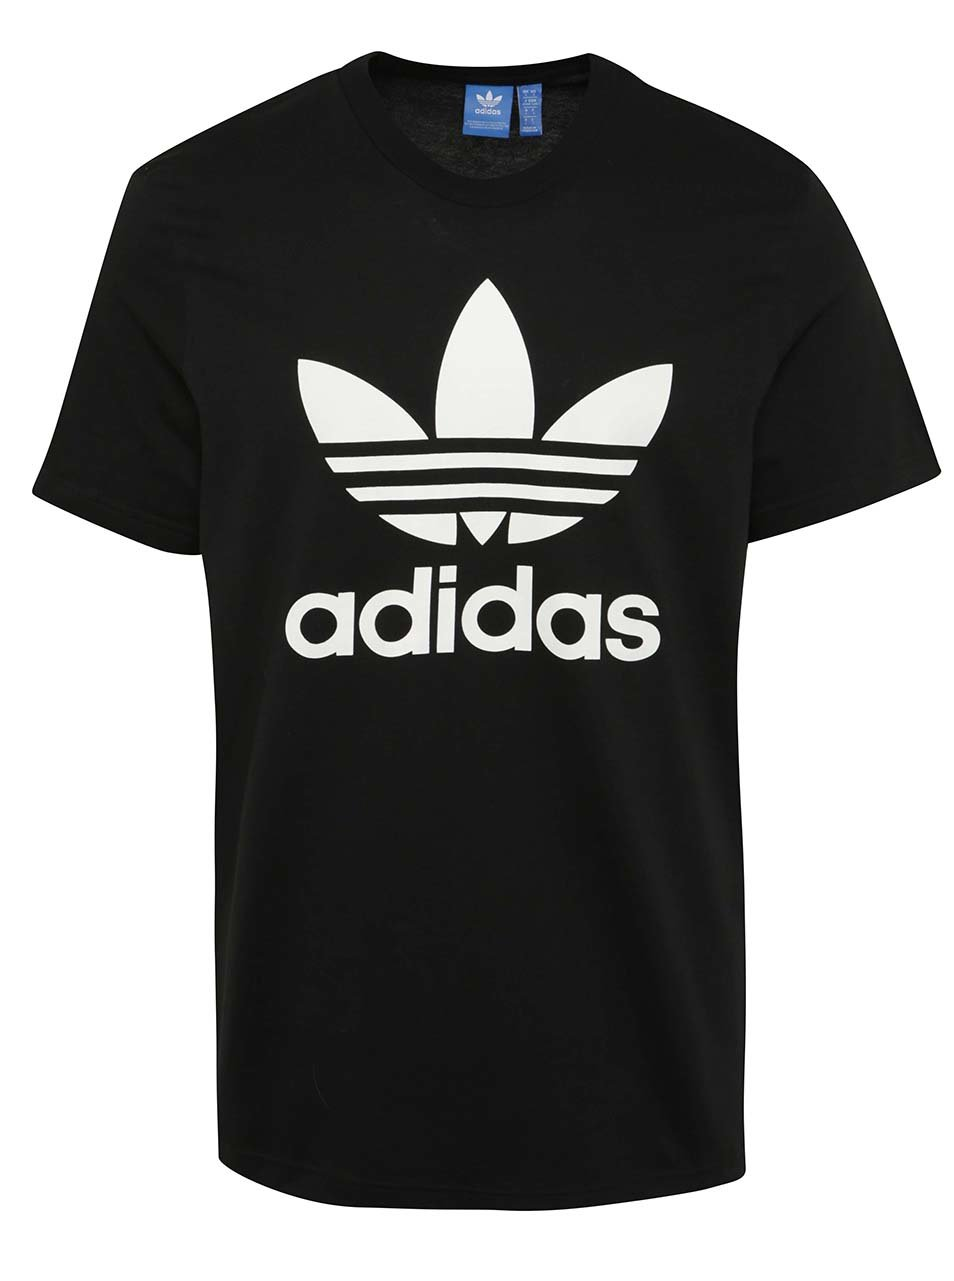 Černé pánské tričko s krátkým rukávem adidas Originals